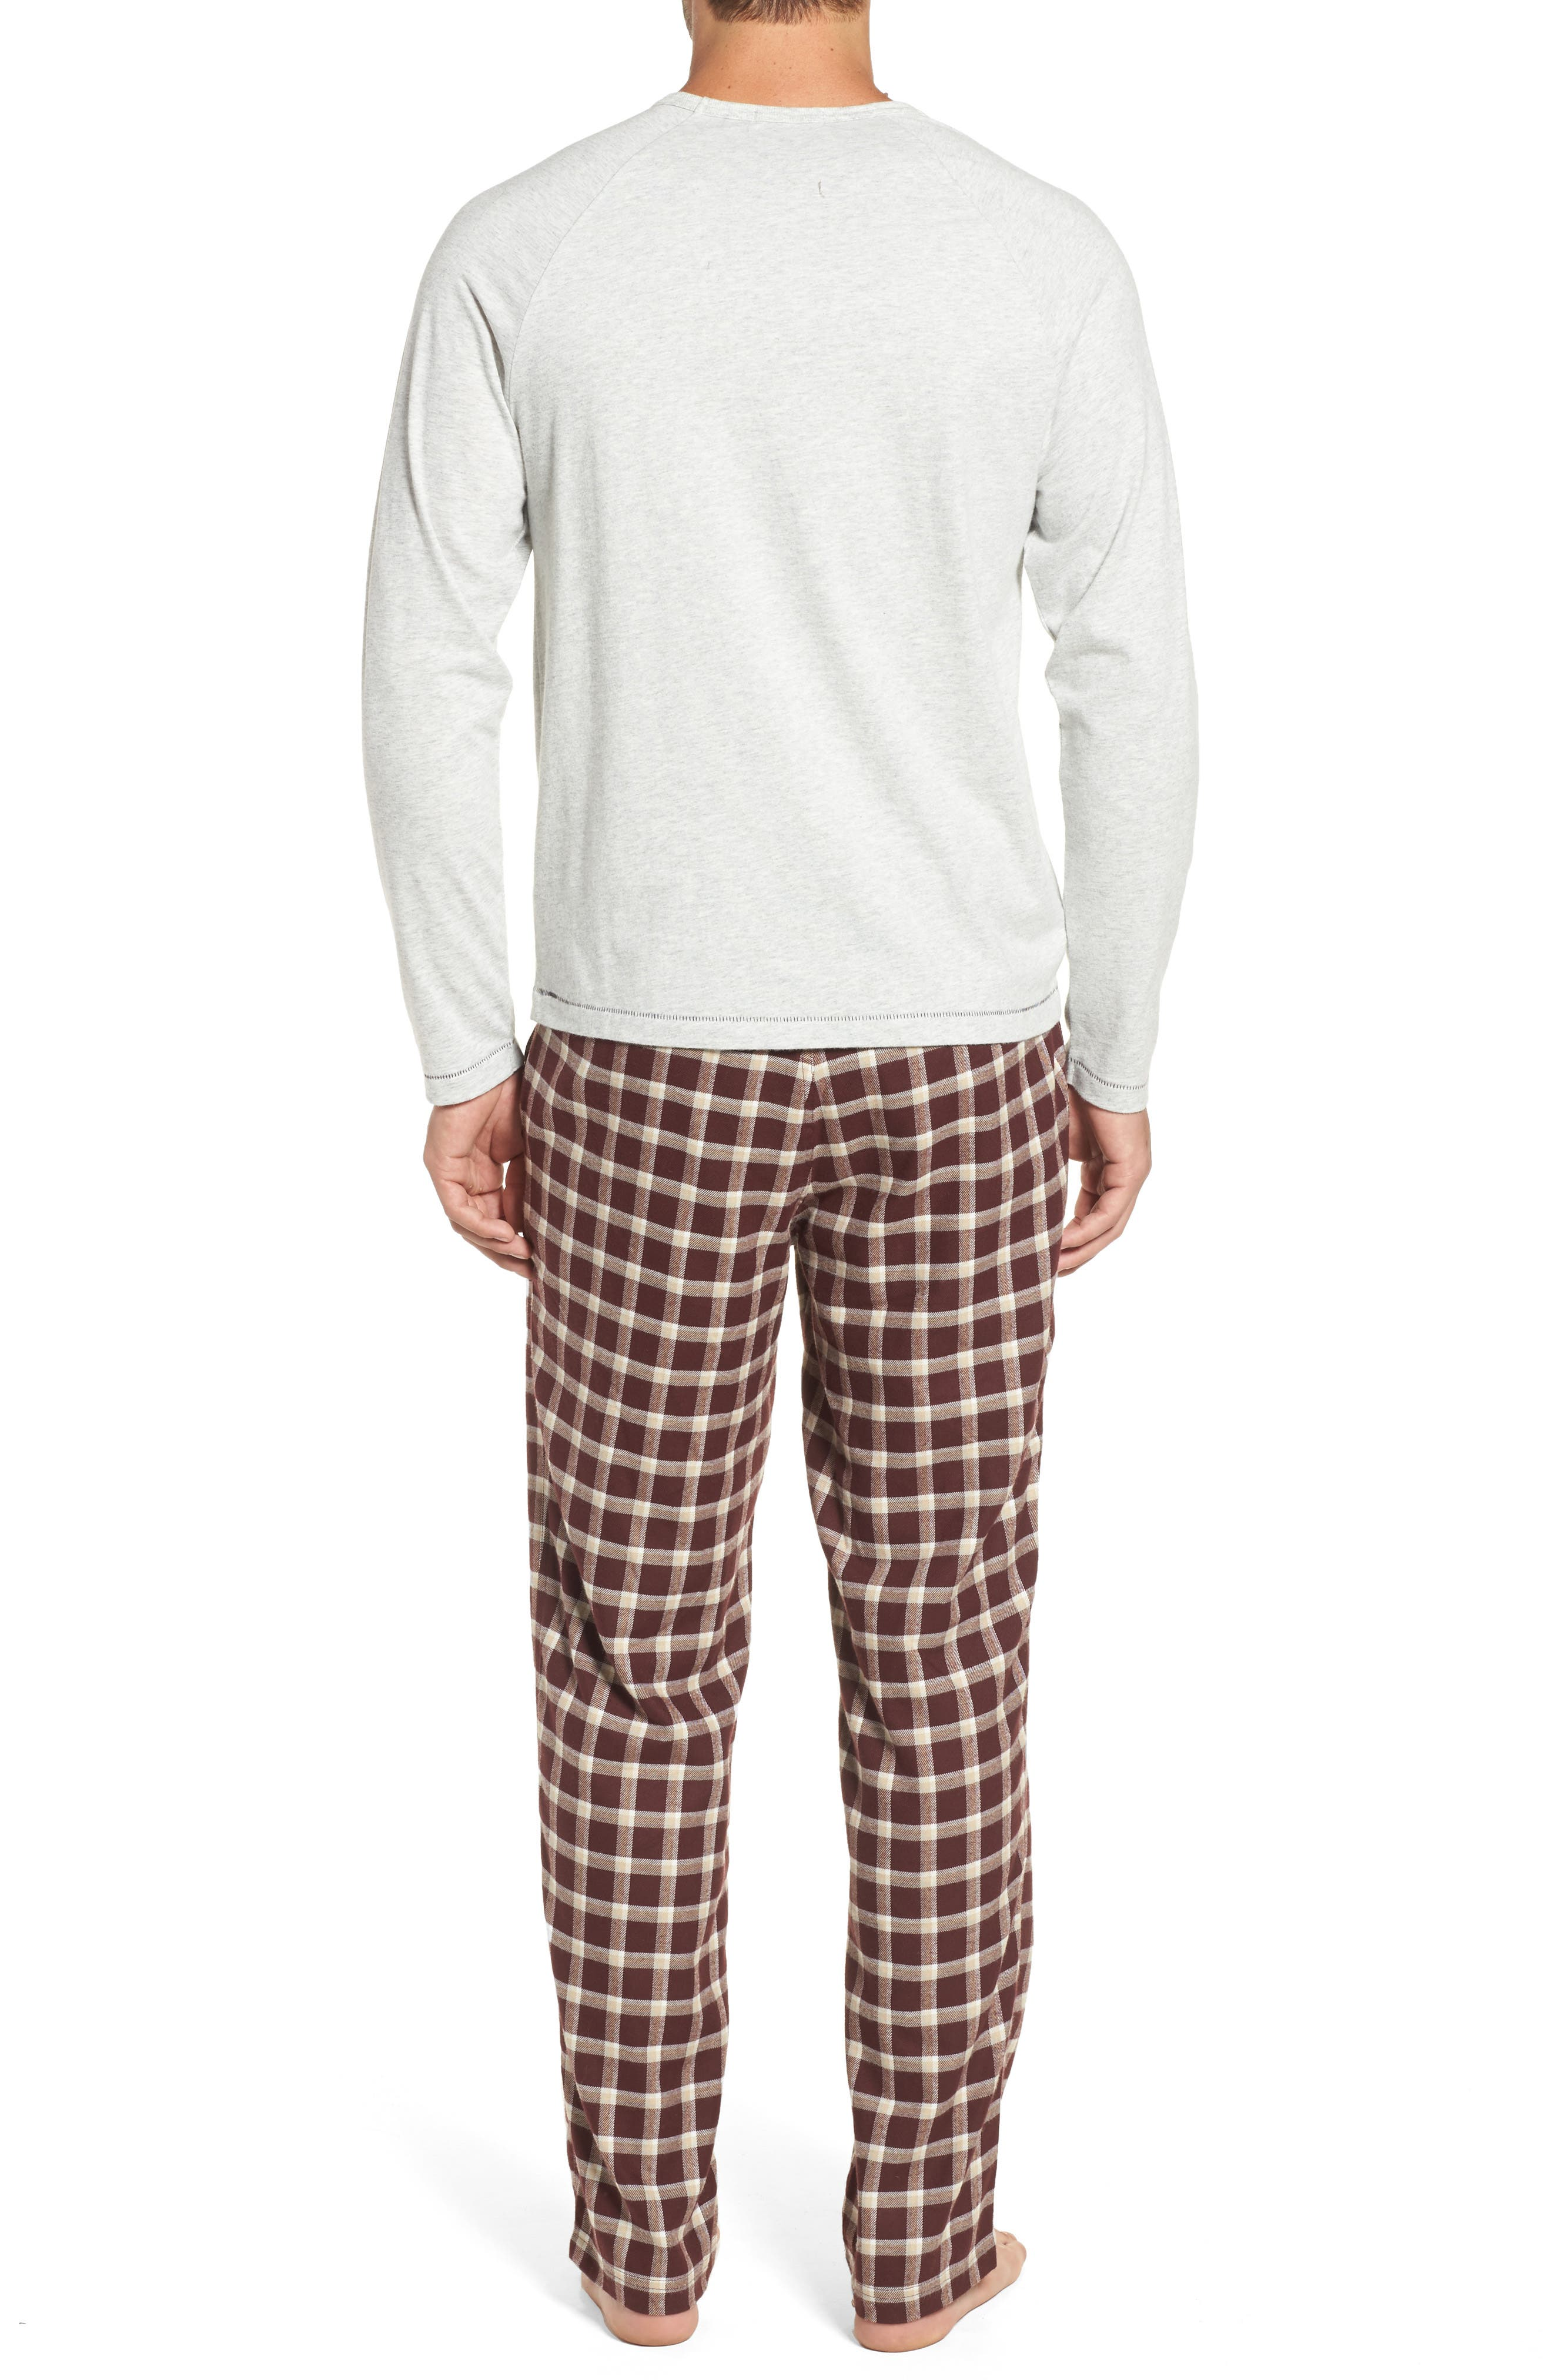 Steiner Pajama Set,                             Alternate thumbnail 6, color,